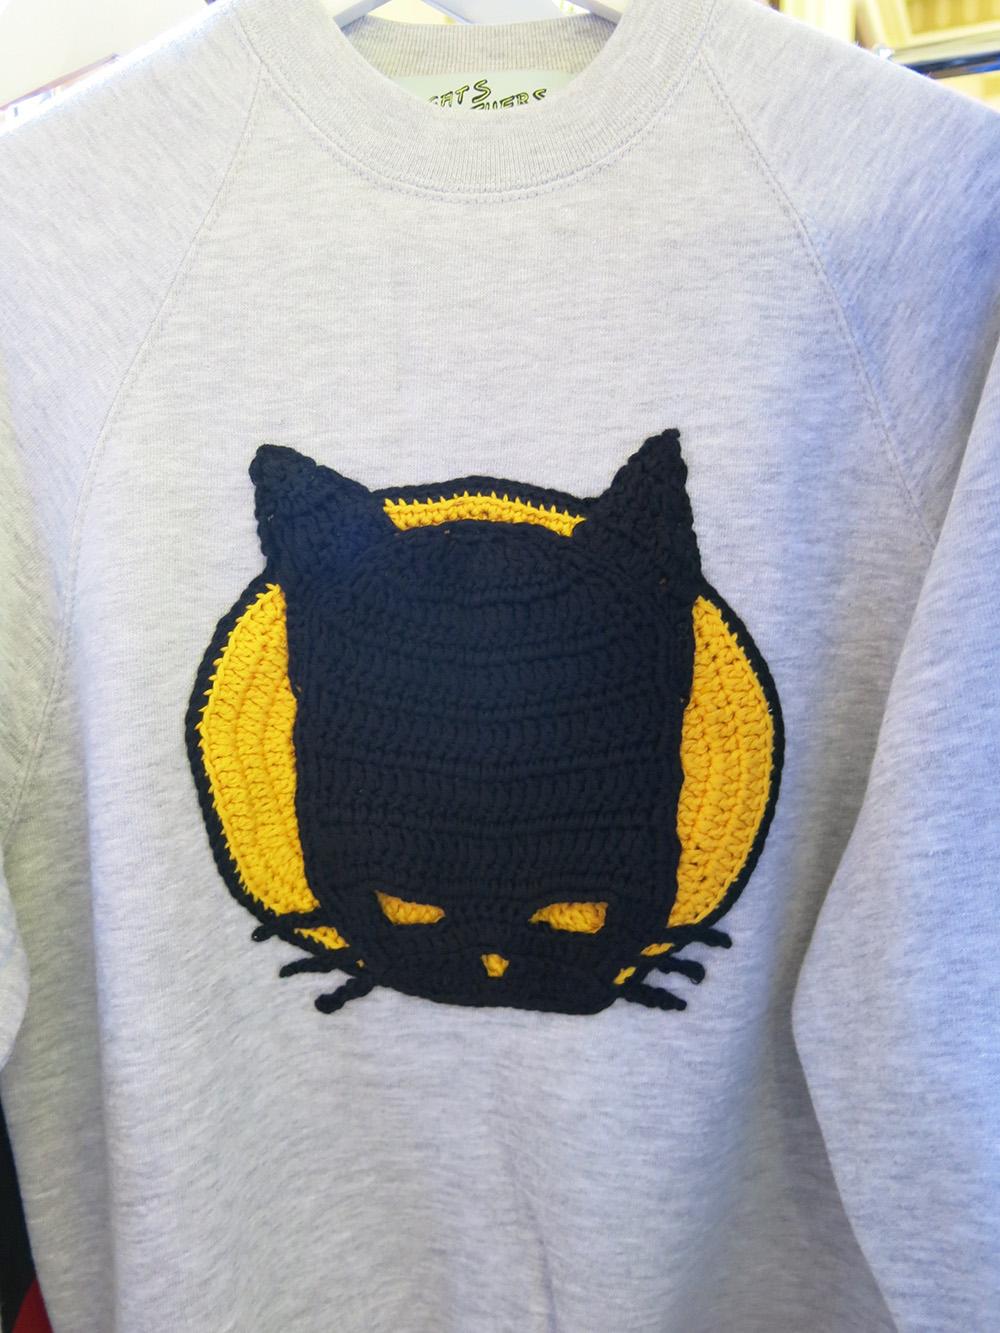 Cats Brothers crocheted sweatshirt